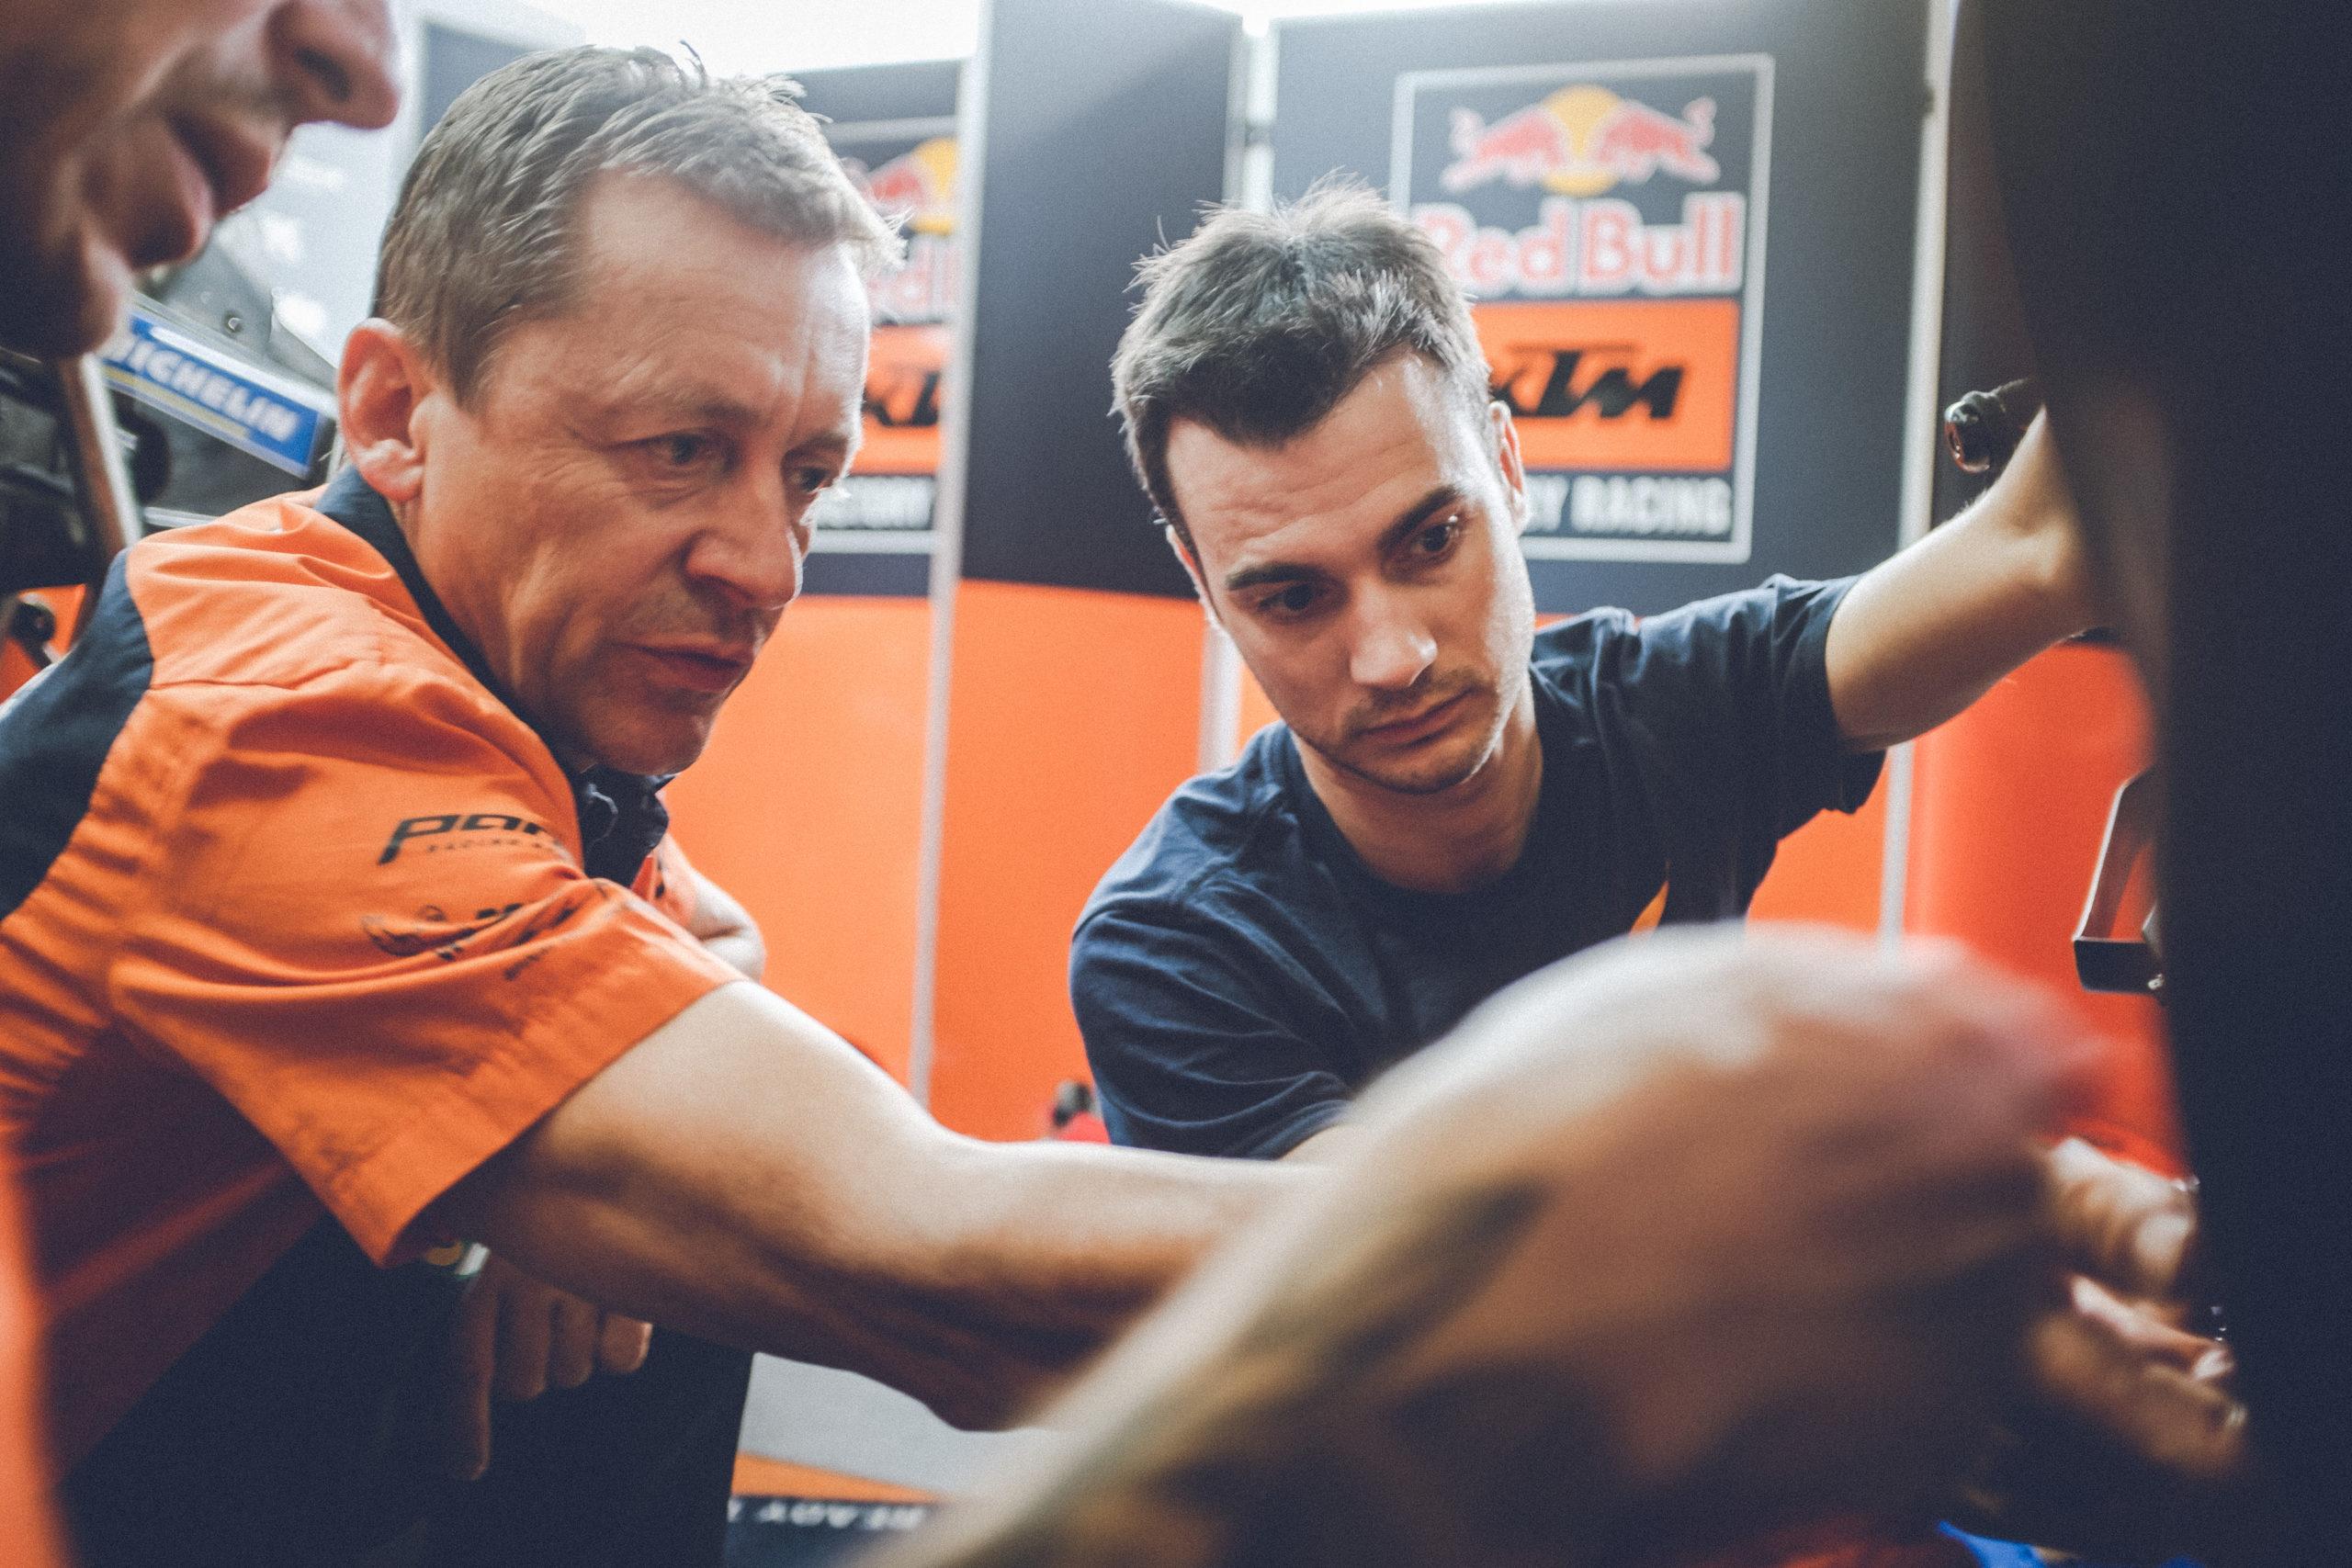 300950_Dani Pedrosa and Mike Leitner_KTM RC16_MotoGP_2019_Automotodrom Brno _CZ_2019_08_05-1758